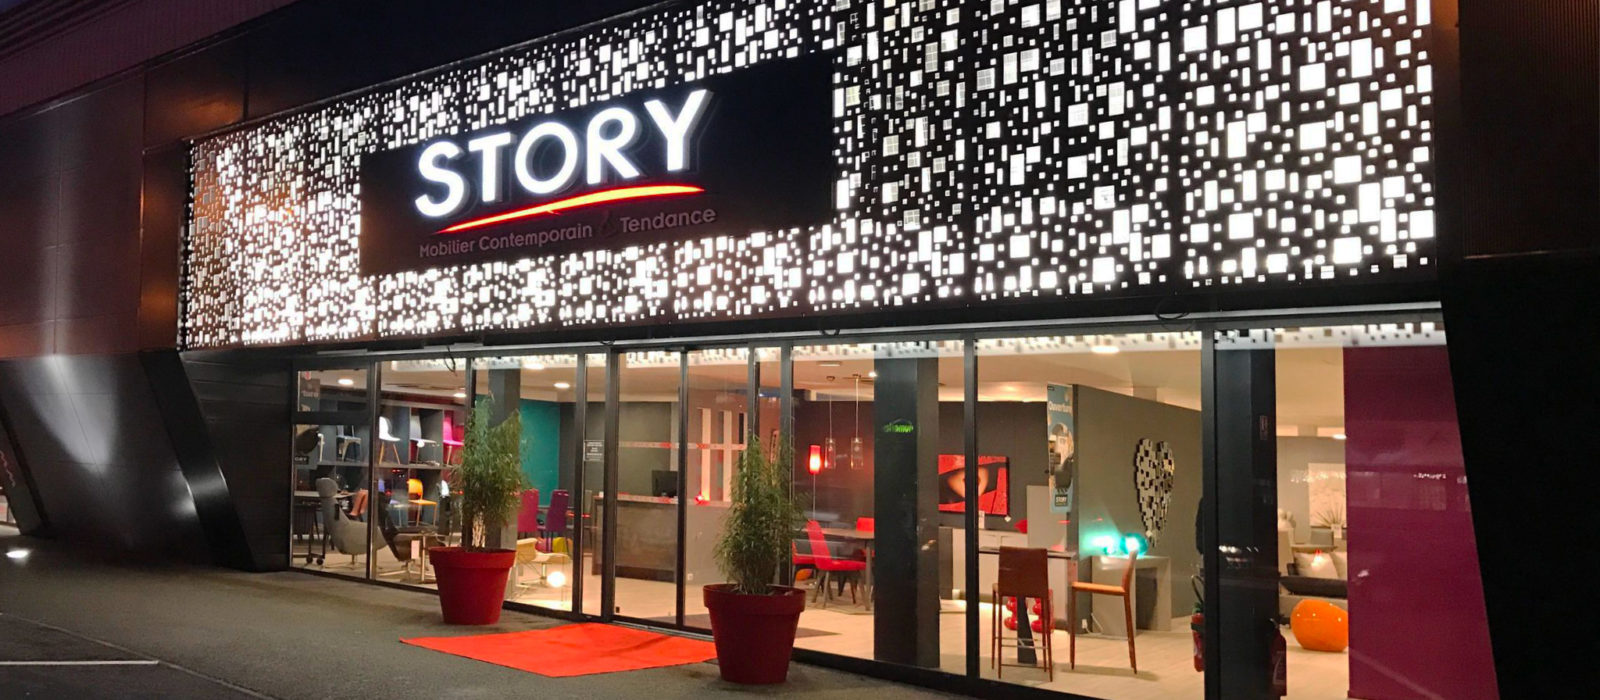 Bordeaux Story Story